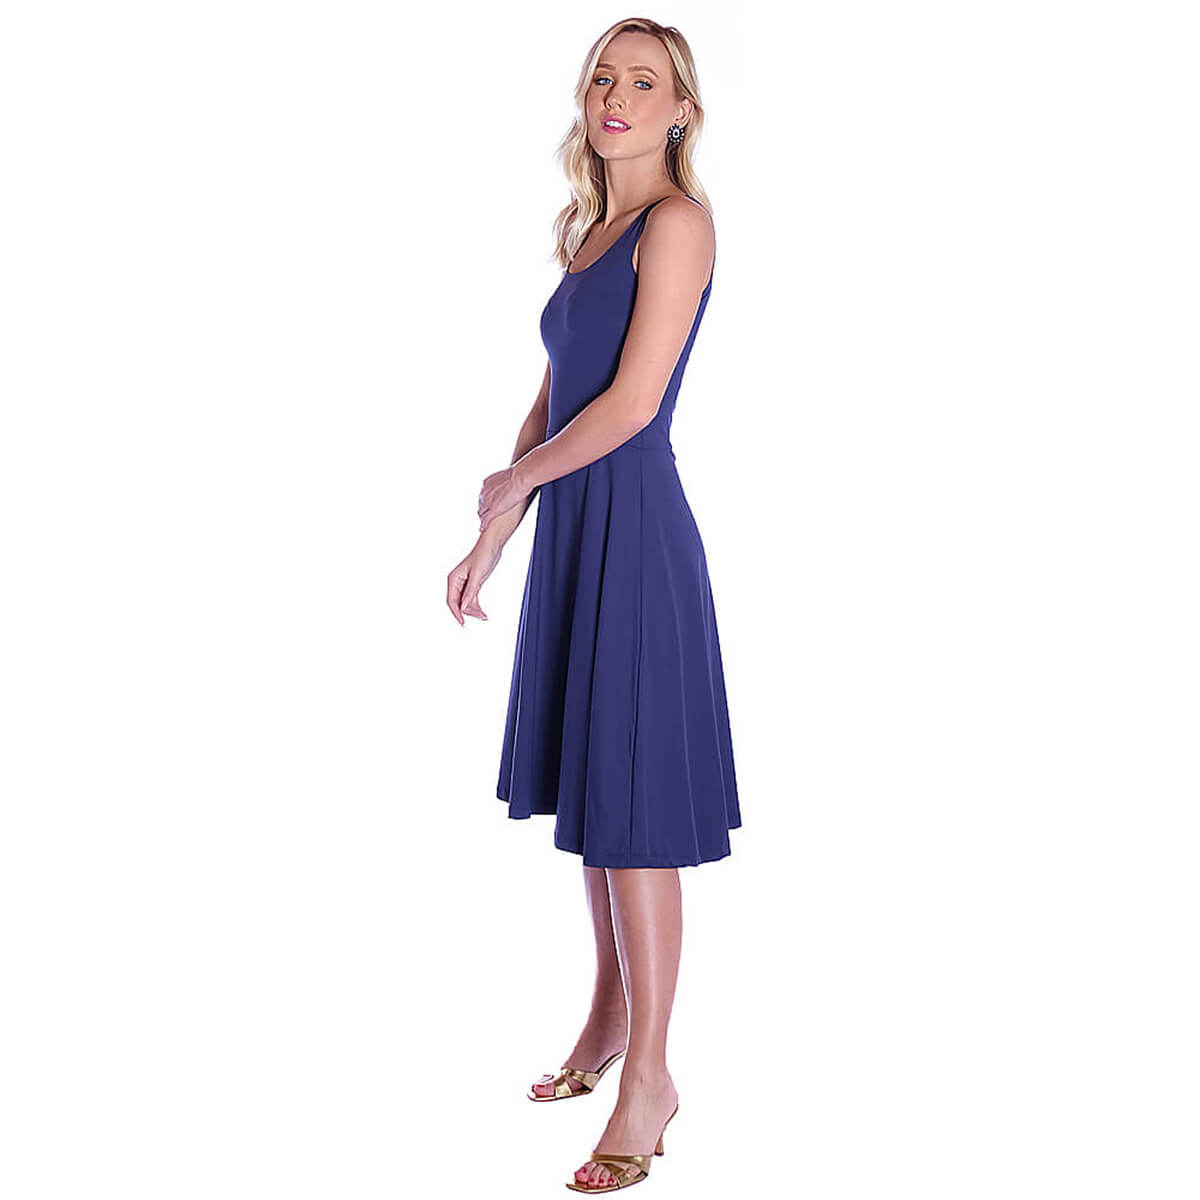 Vestido Azul Marinho FICALINDA Regata Decote Redondo